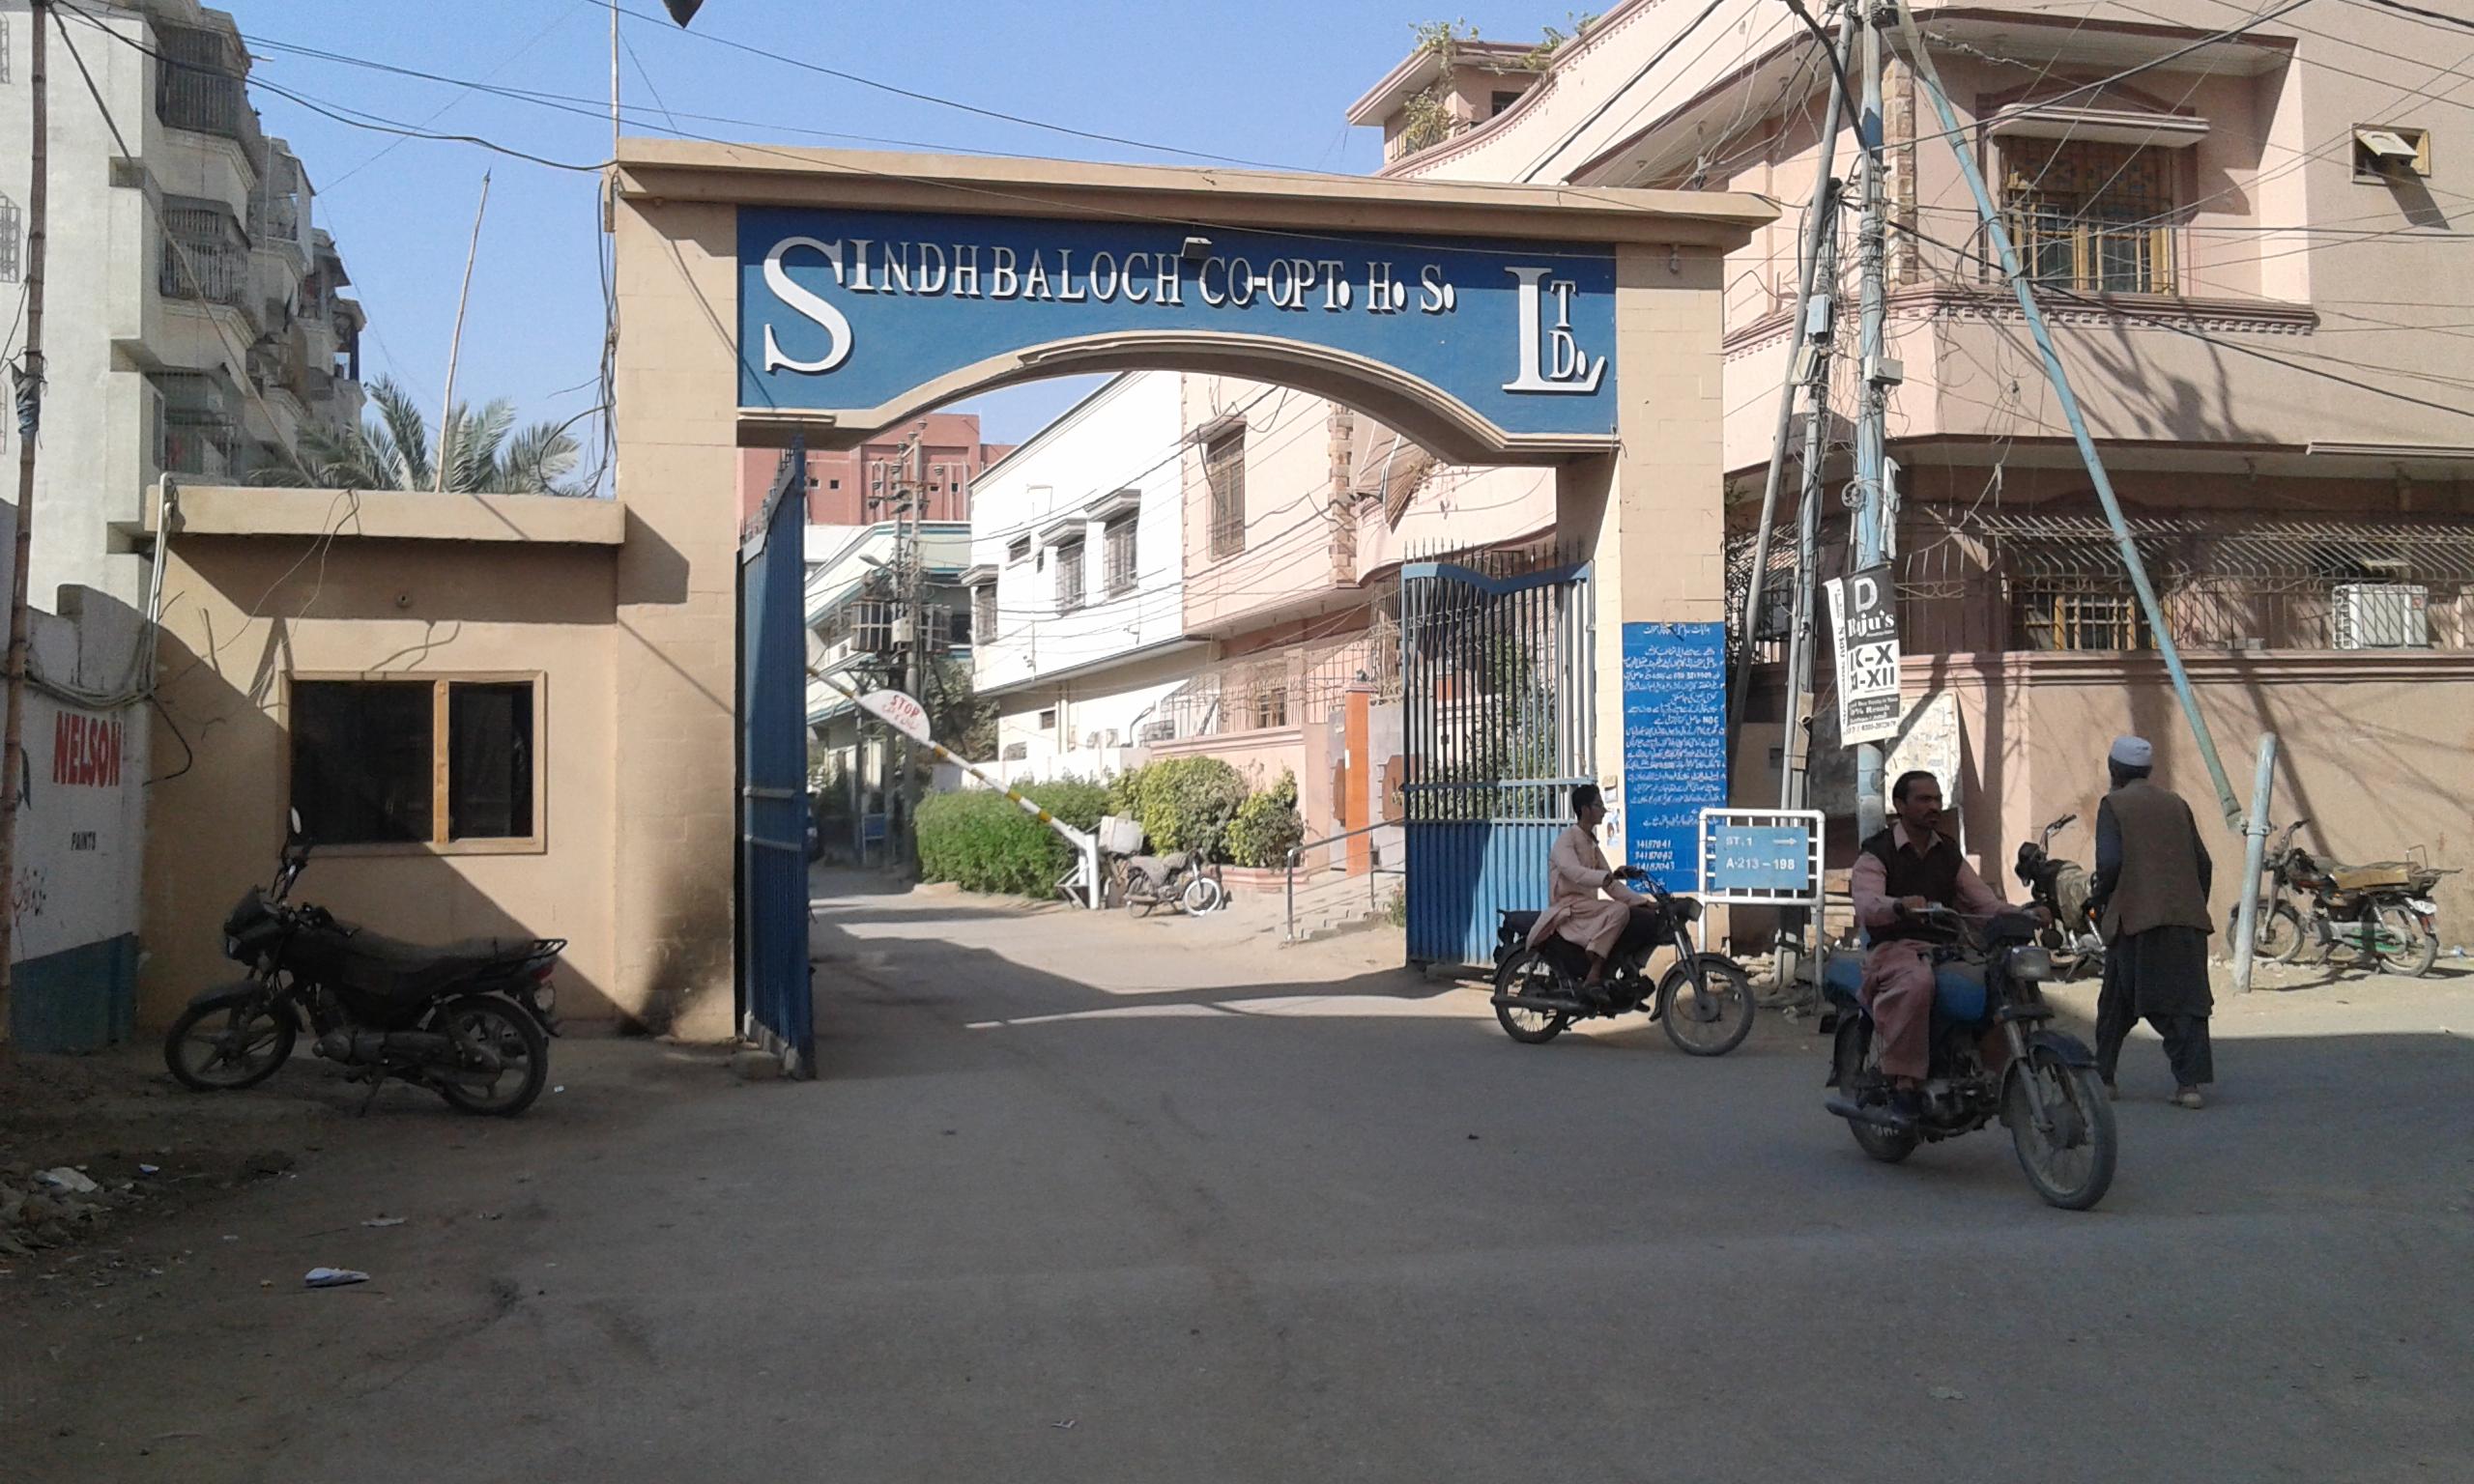 Sindh Baloch Society - Wikipedia